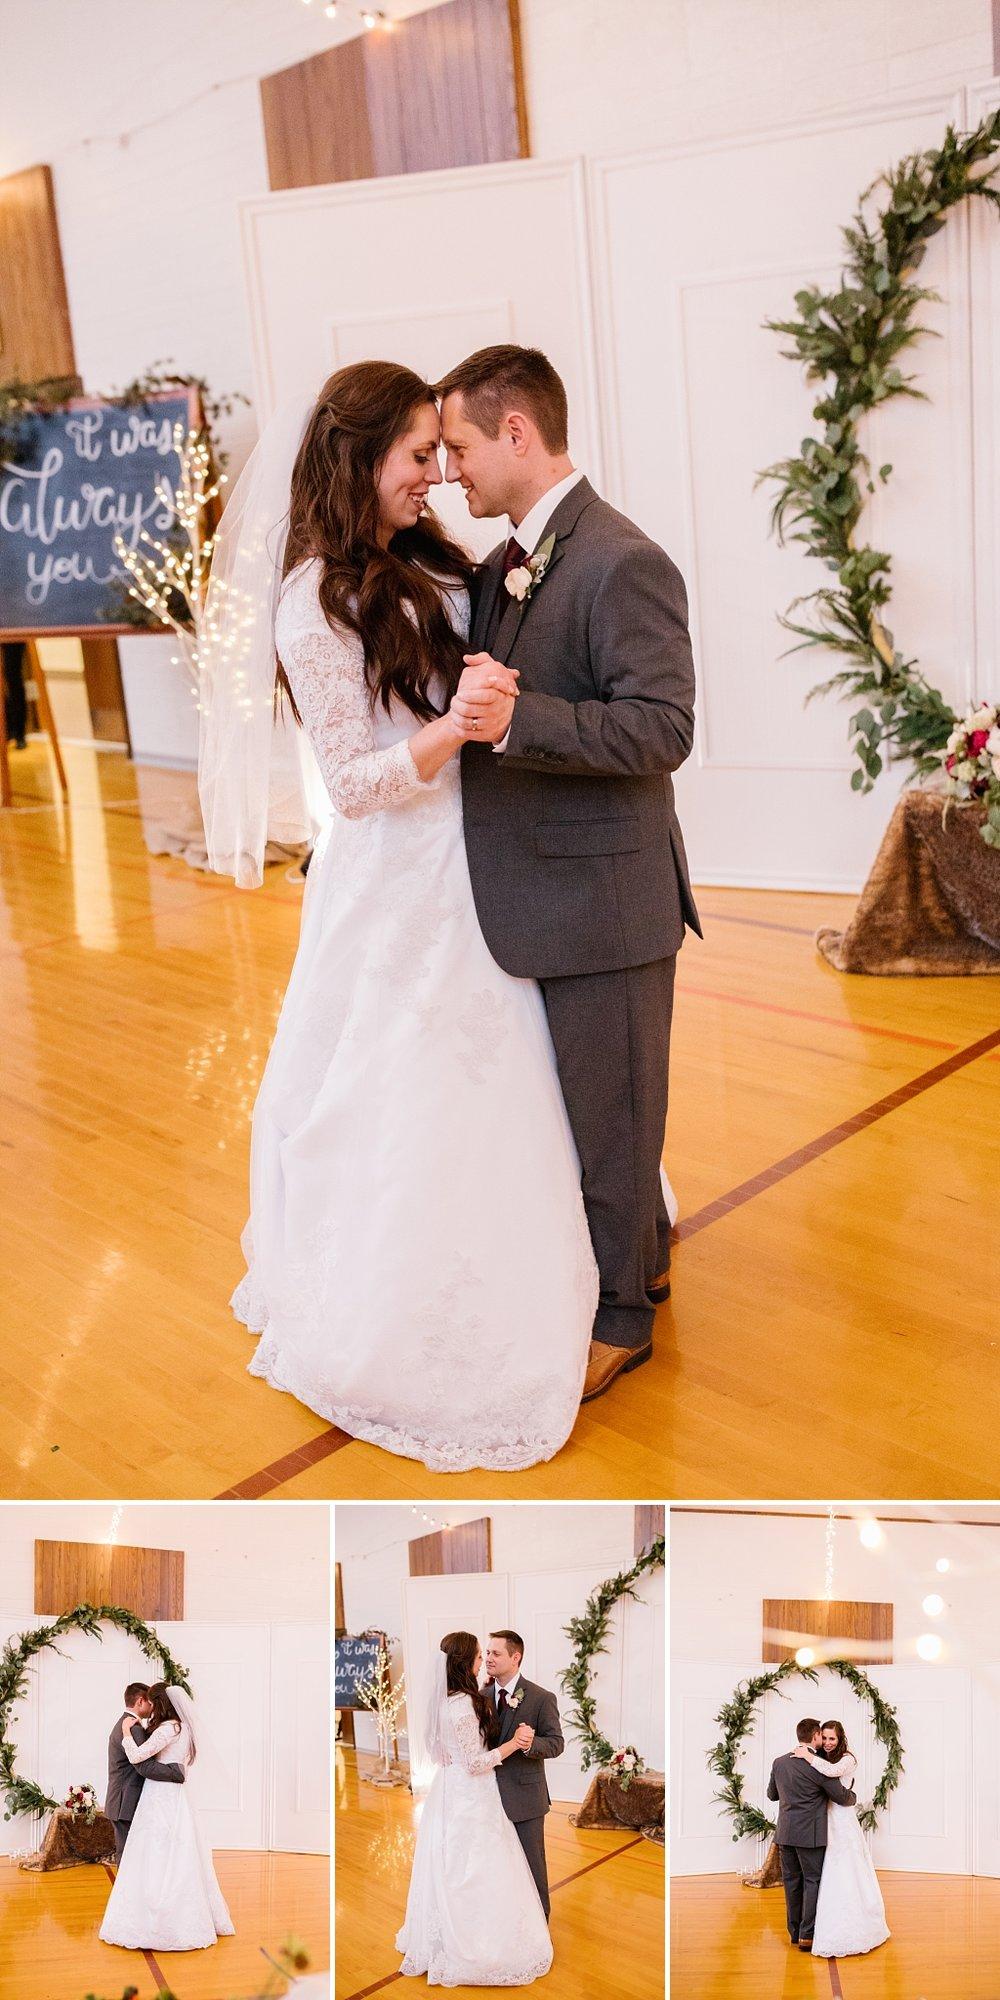 SS-Wedding-451_Lizzie-B-Imagery-Utah-Wedding-Photographer-Logan-Temple-Logan-Canyon-Mountain-Horse-Session.jpg